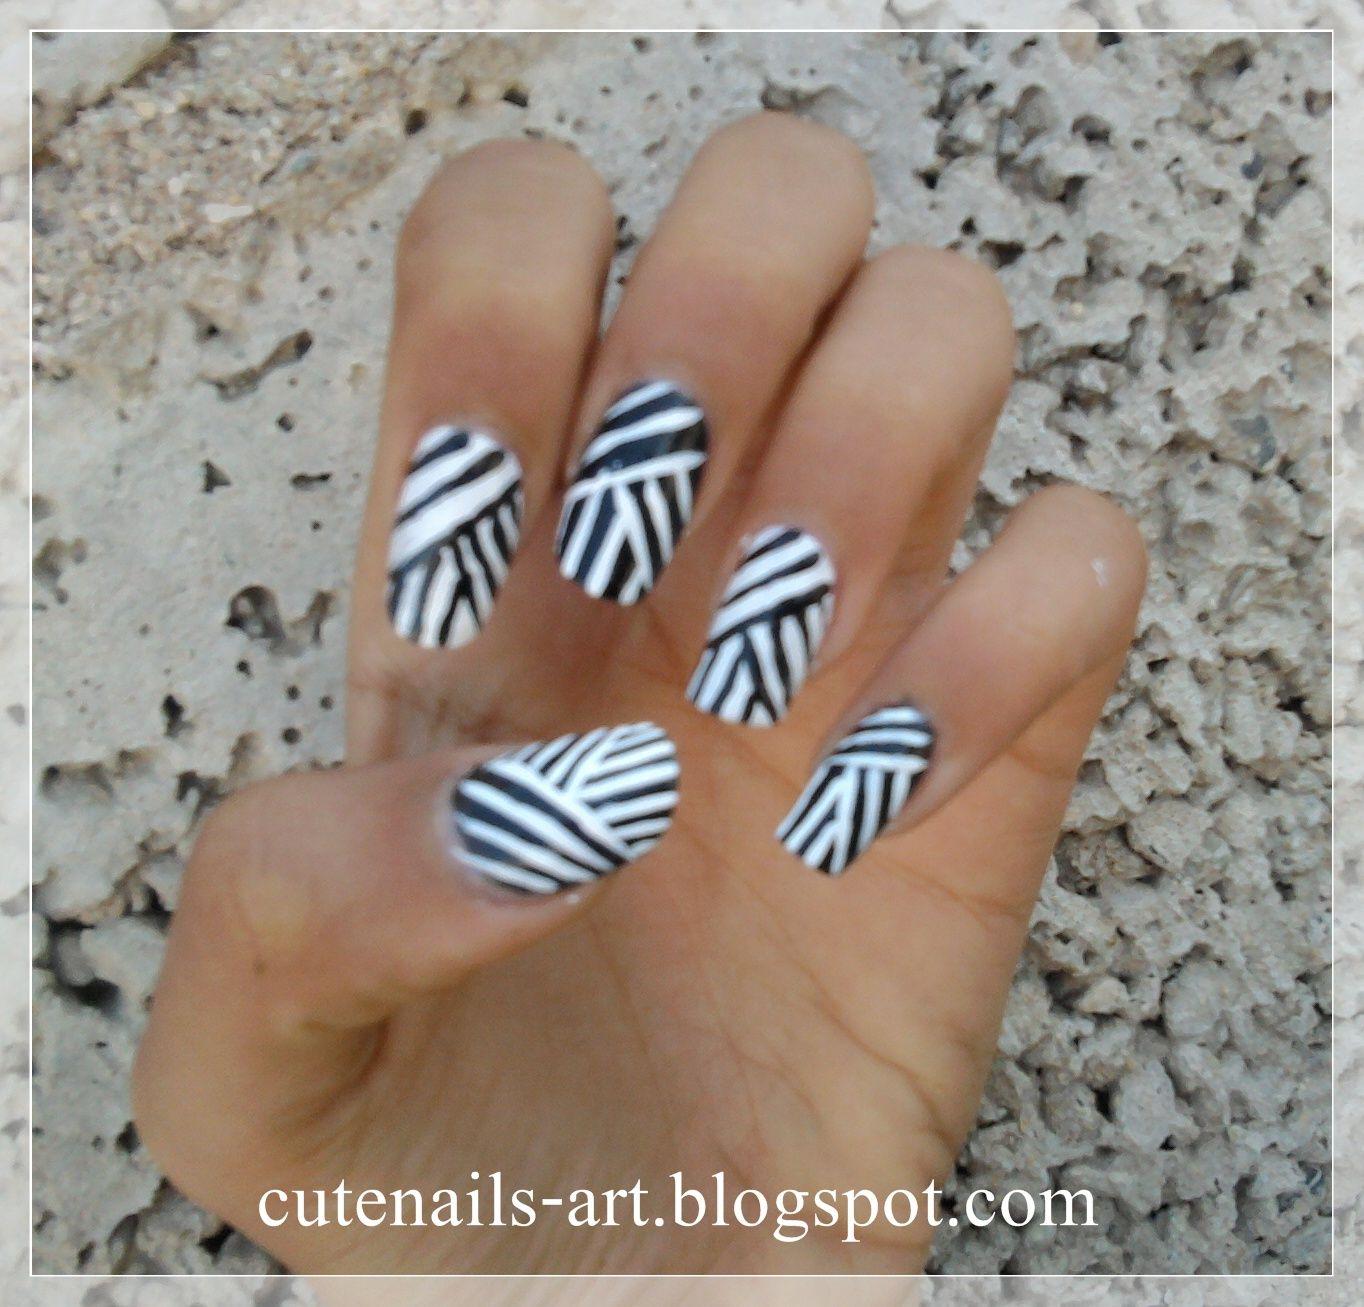 black nail art | cutenails-art | Nail Couture | Pinterest | Black ...